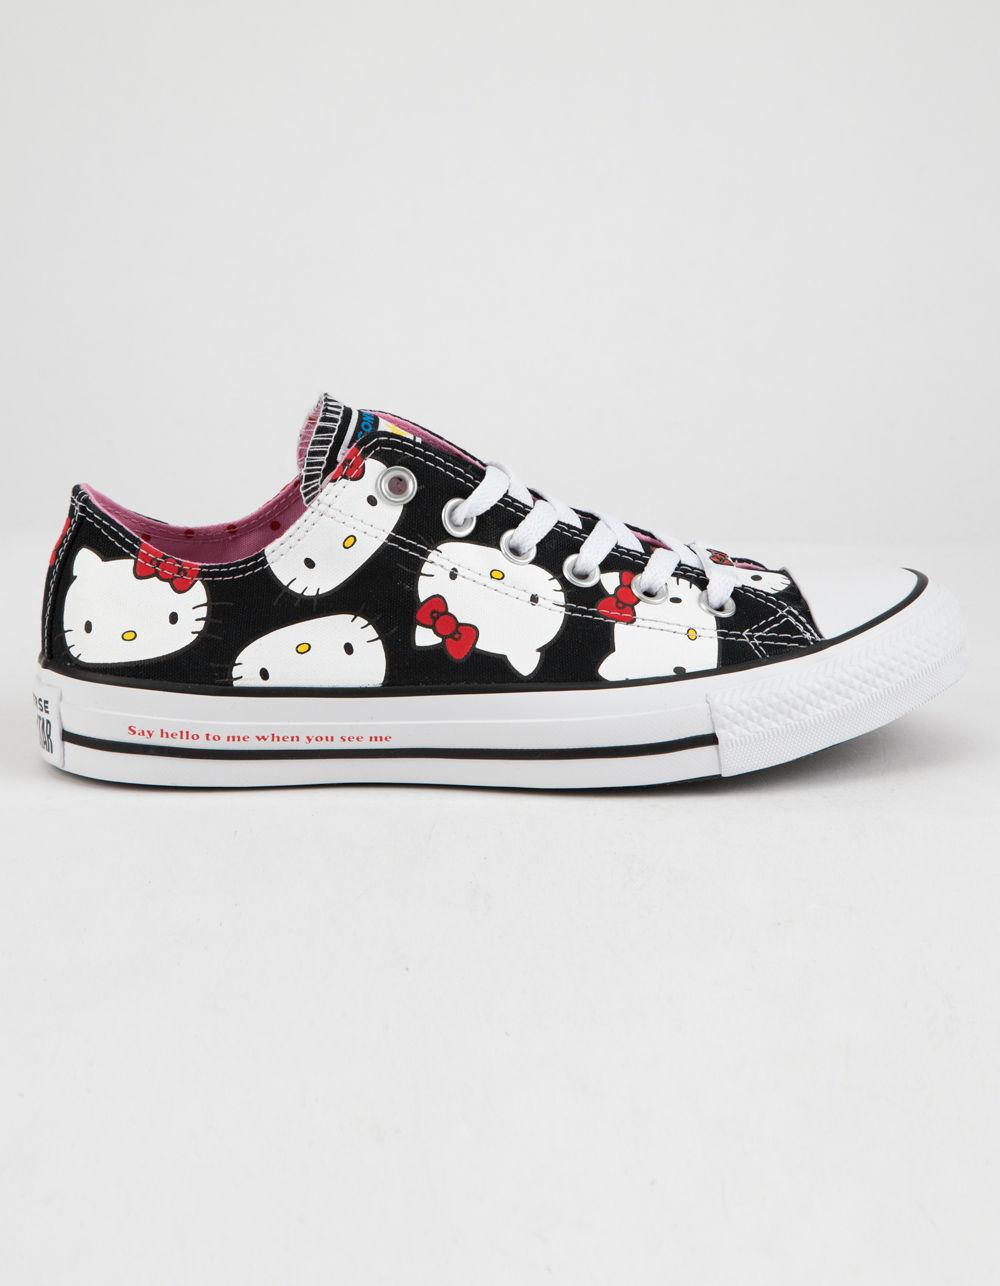 af843a9a9c Lyst - Converse X Hello Kitty Chuck Taylor All Star Black   Prism ...